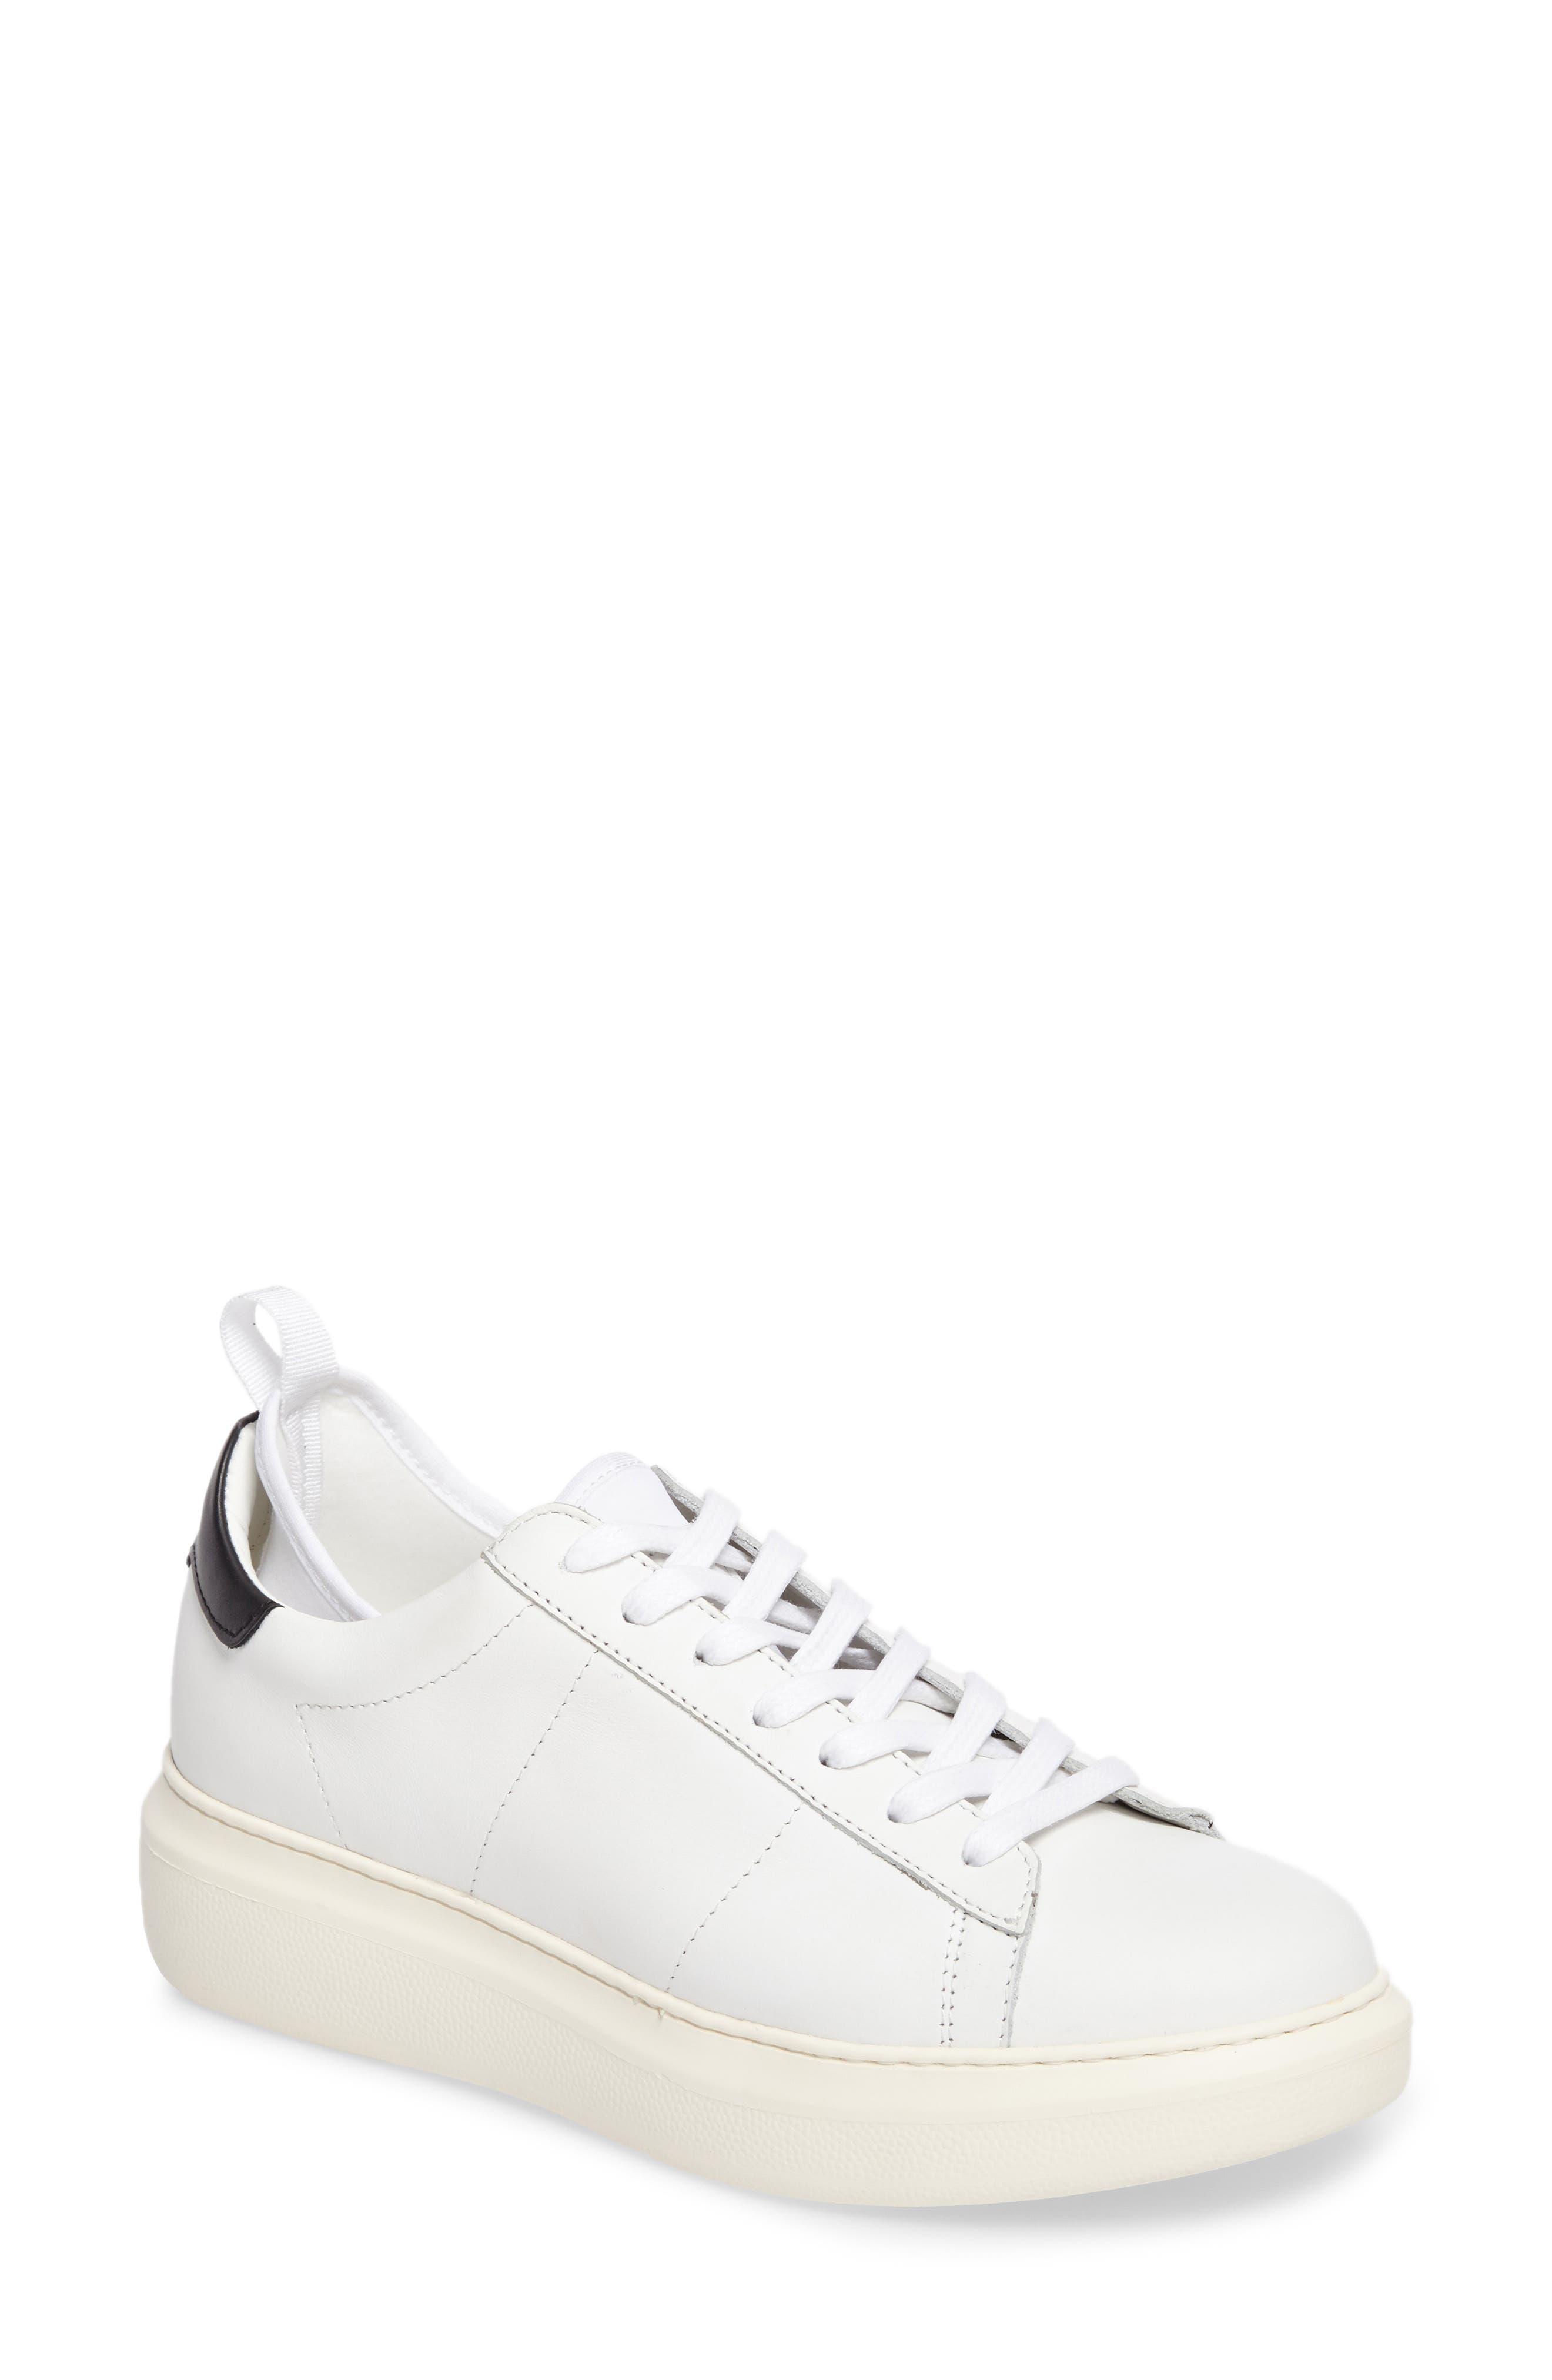 Alternate Image 1 Selected - Greats Alta Low Top Sneaker (Women)